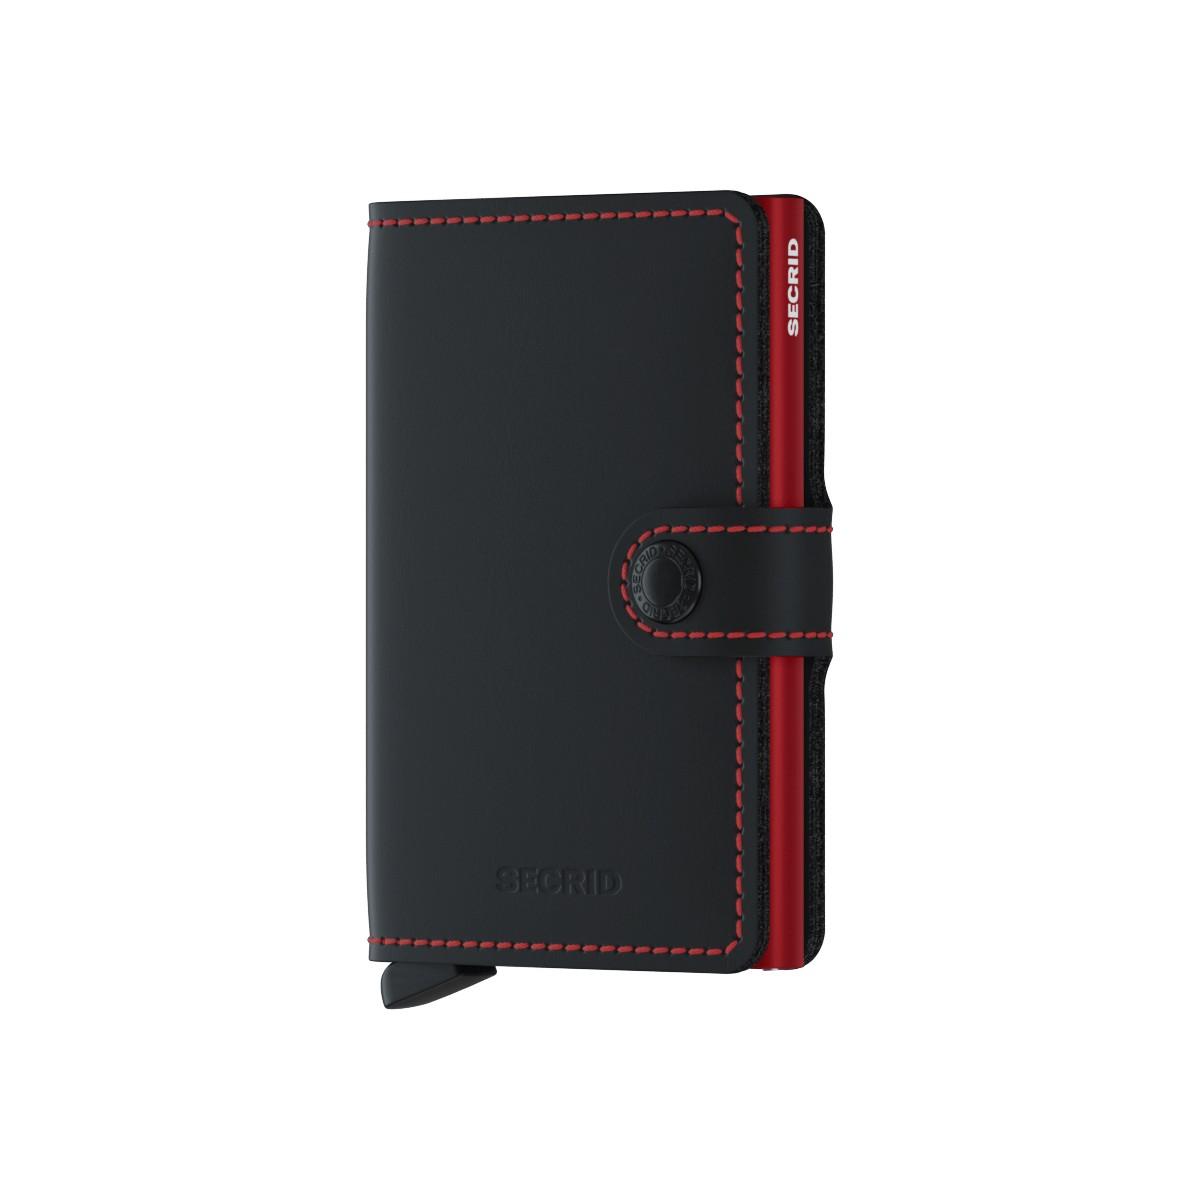 Aluminum Card Holder Wallet Holds Up to 7 Cards Rose Walter Wallet Slim